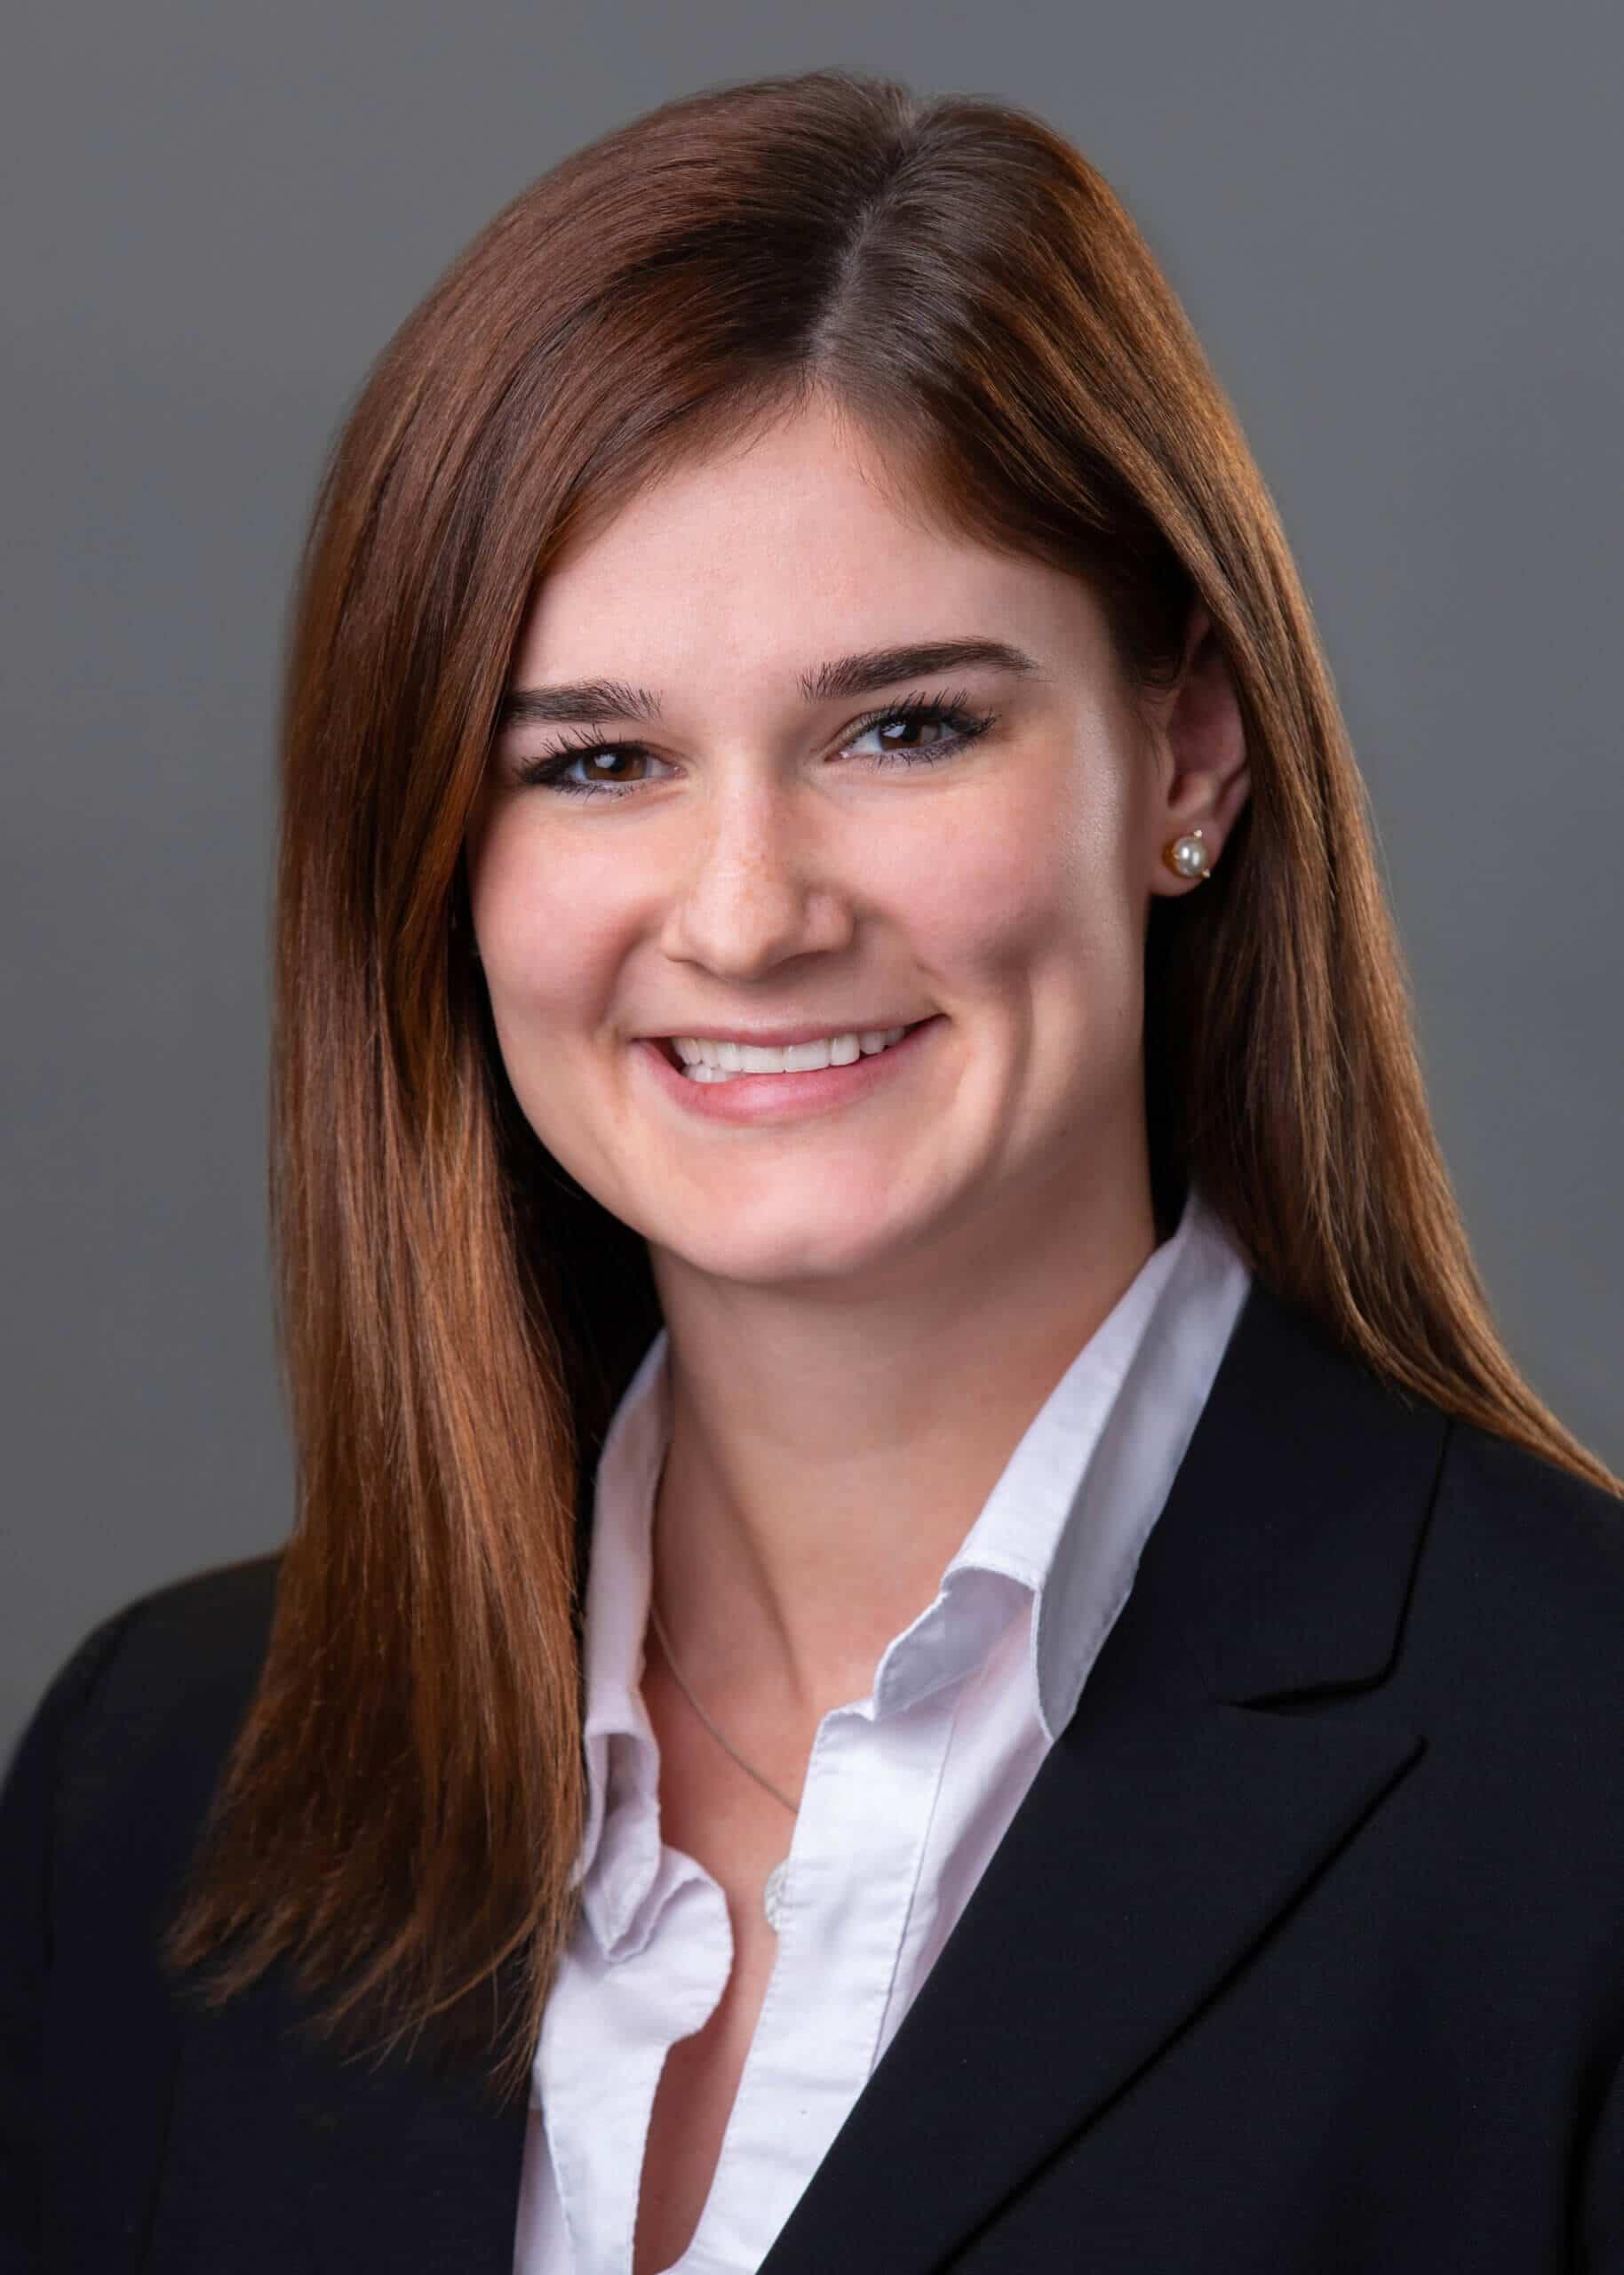 Shelby Kimmick - Headshot - Staff Accountant